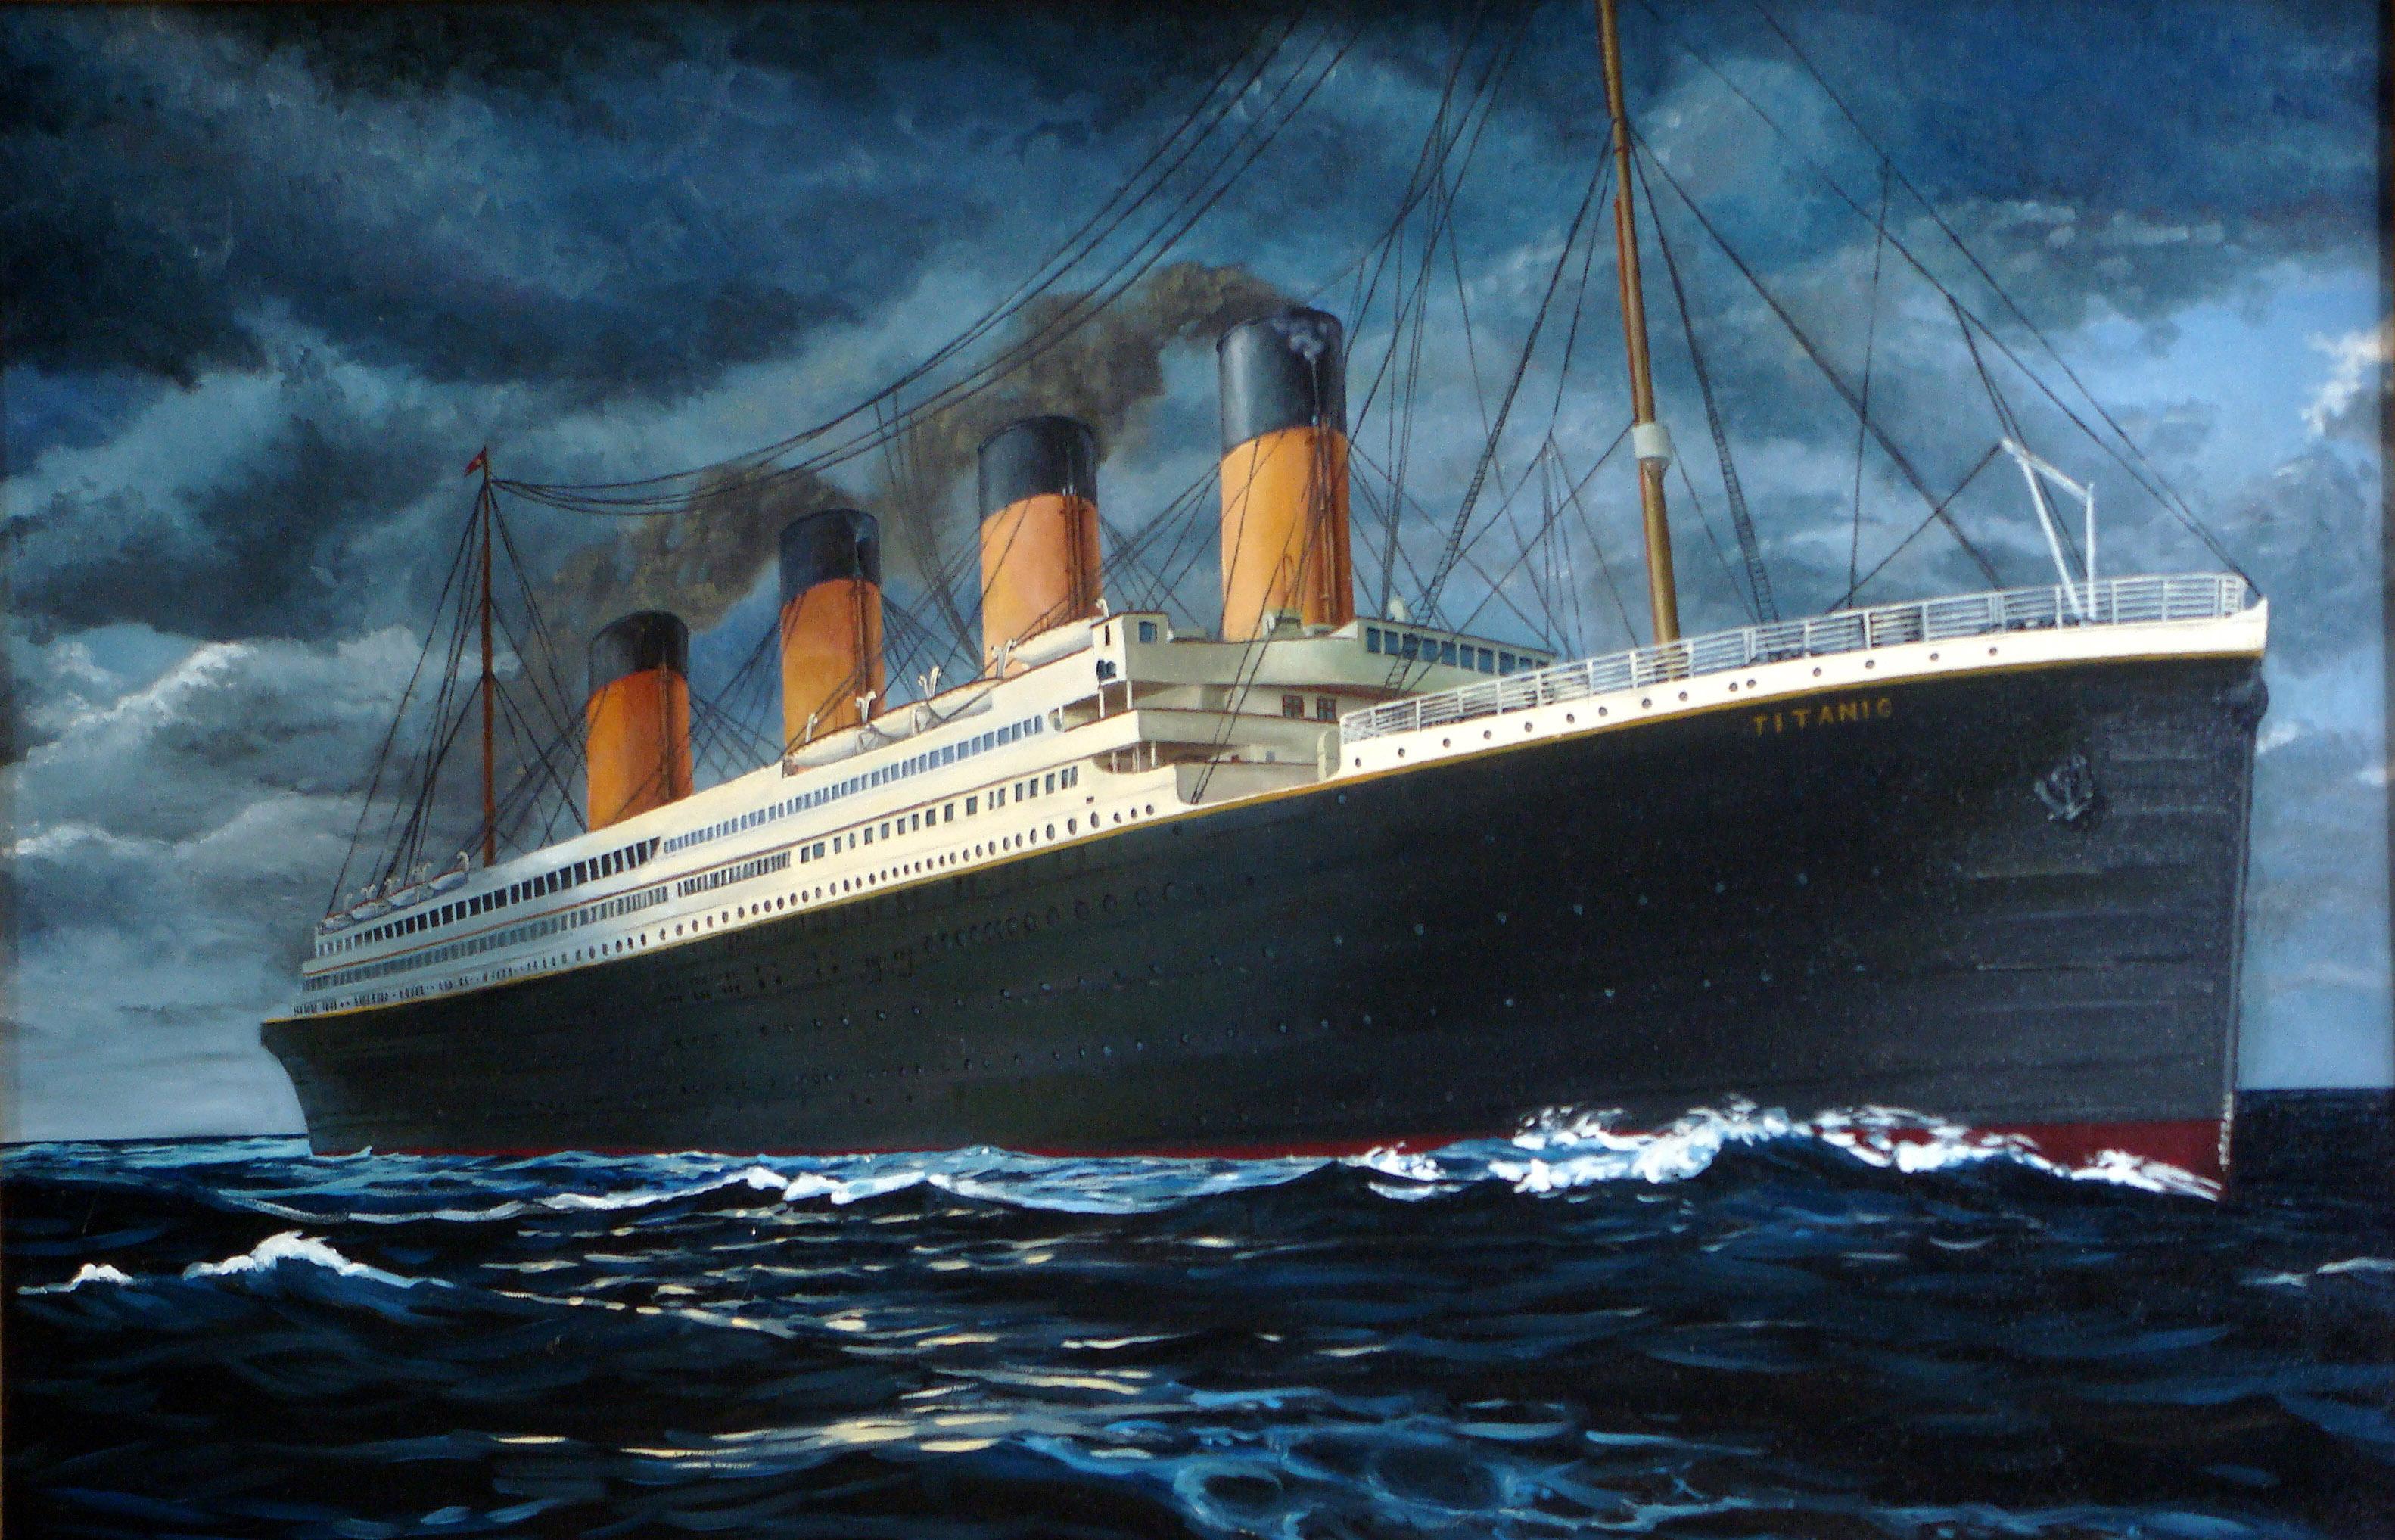 HDoboi.Kiev.ua - Титаник роковой корабль, обои на пк корабли